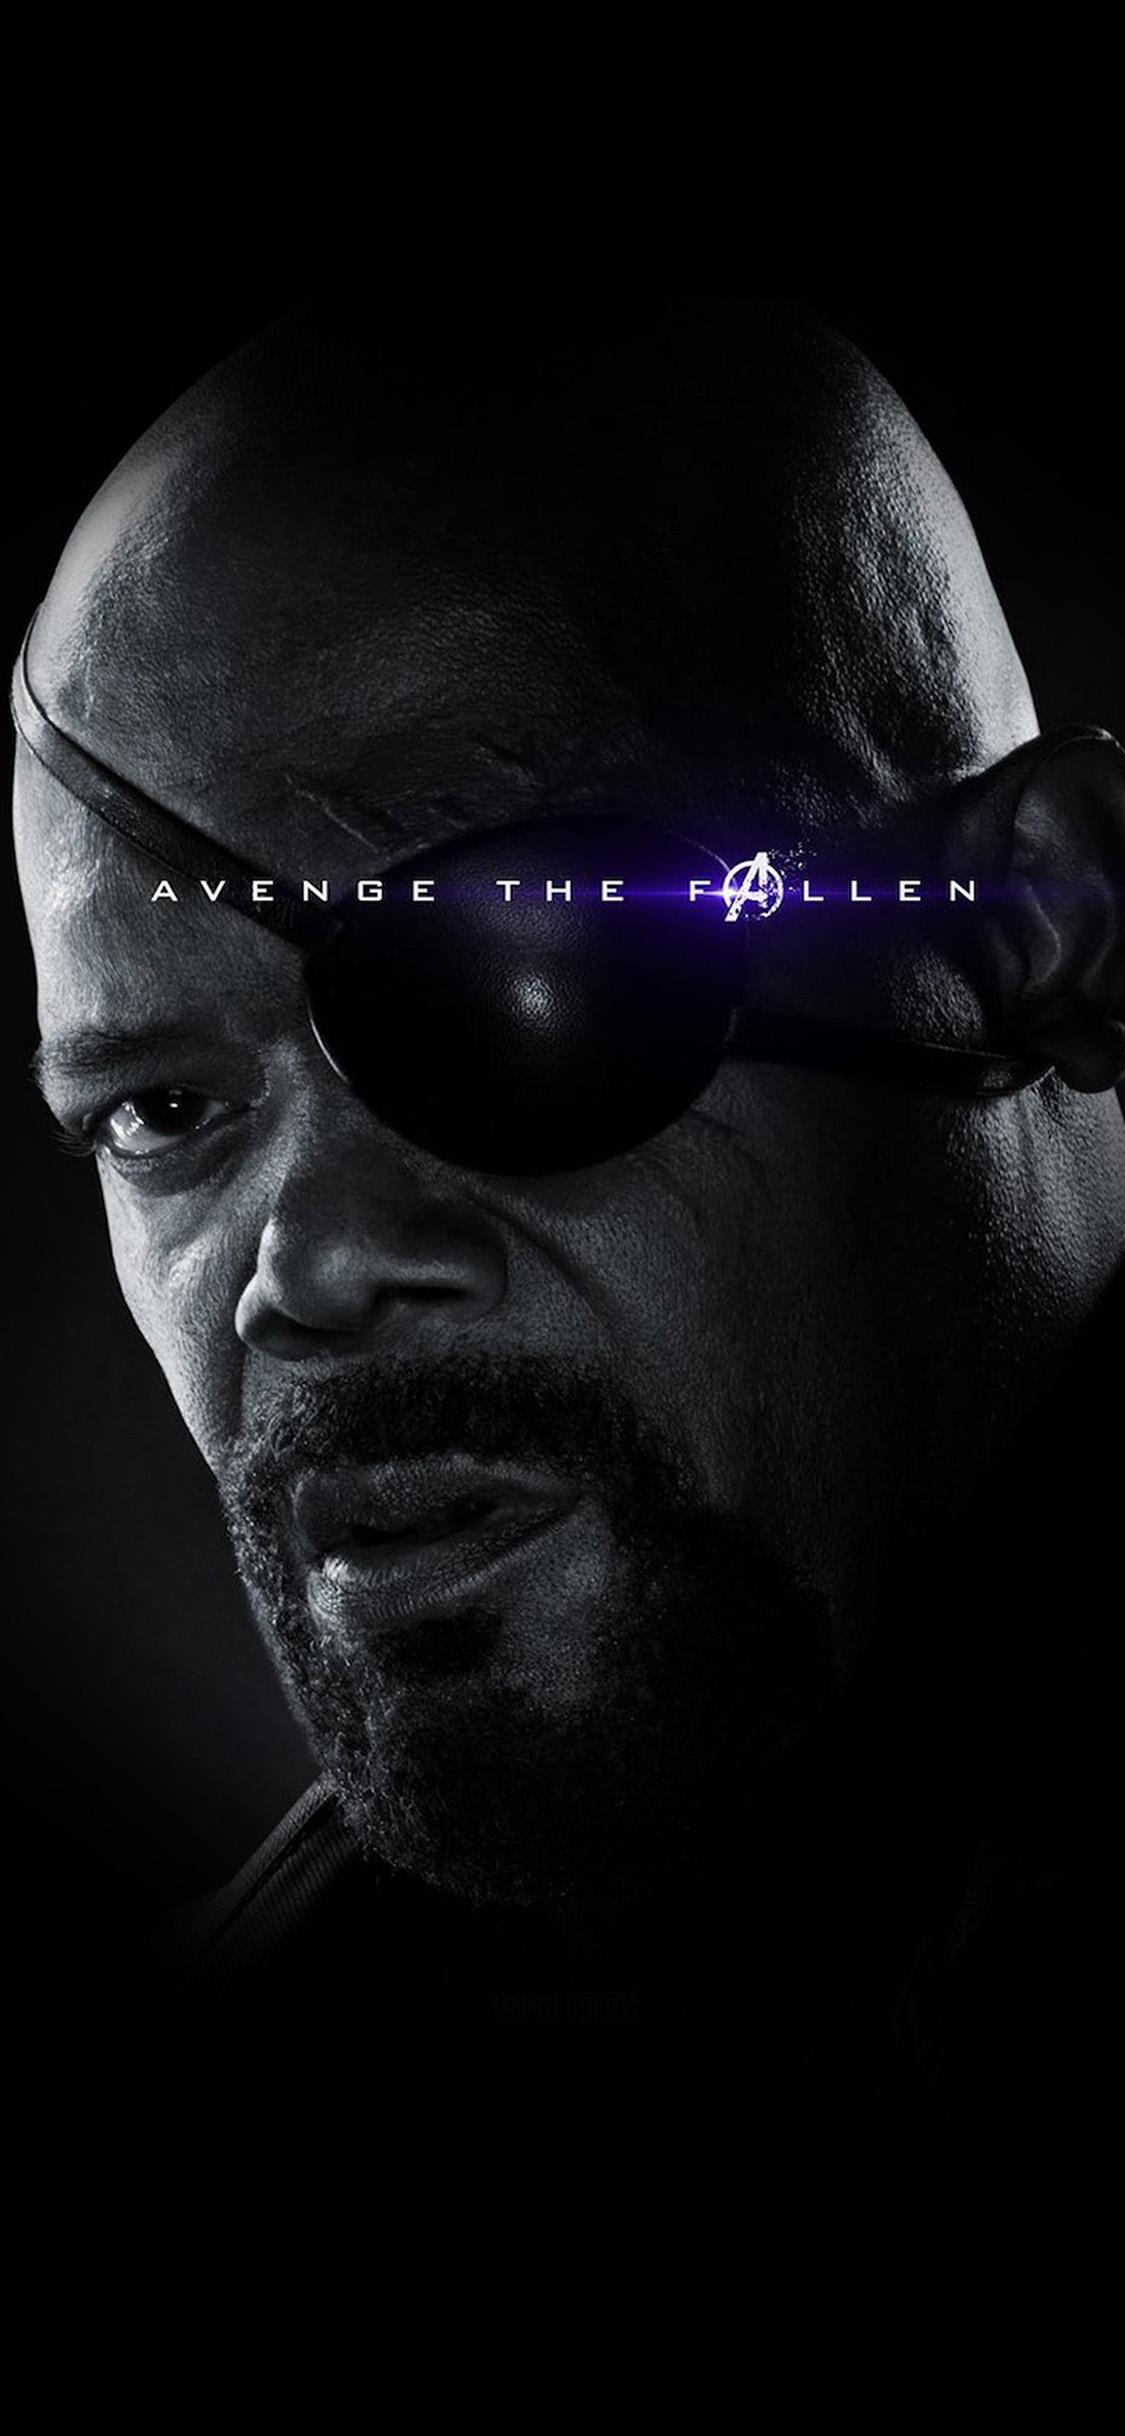 iPhonexpapers.com-Apple-iPhone-wallpaper-bi49-avengers-endgame-poster-black-hero-chractor-film-art